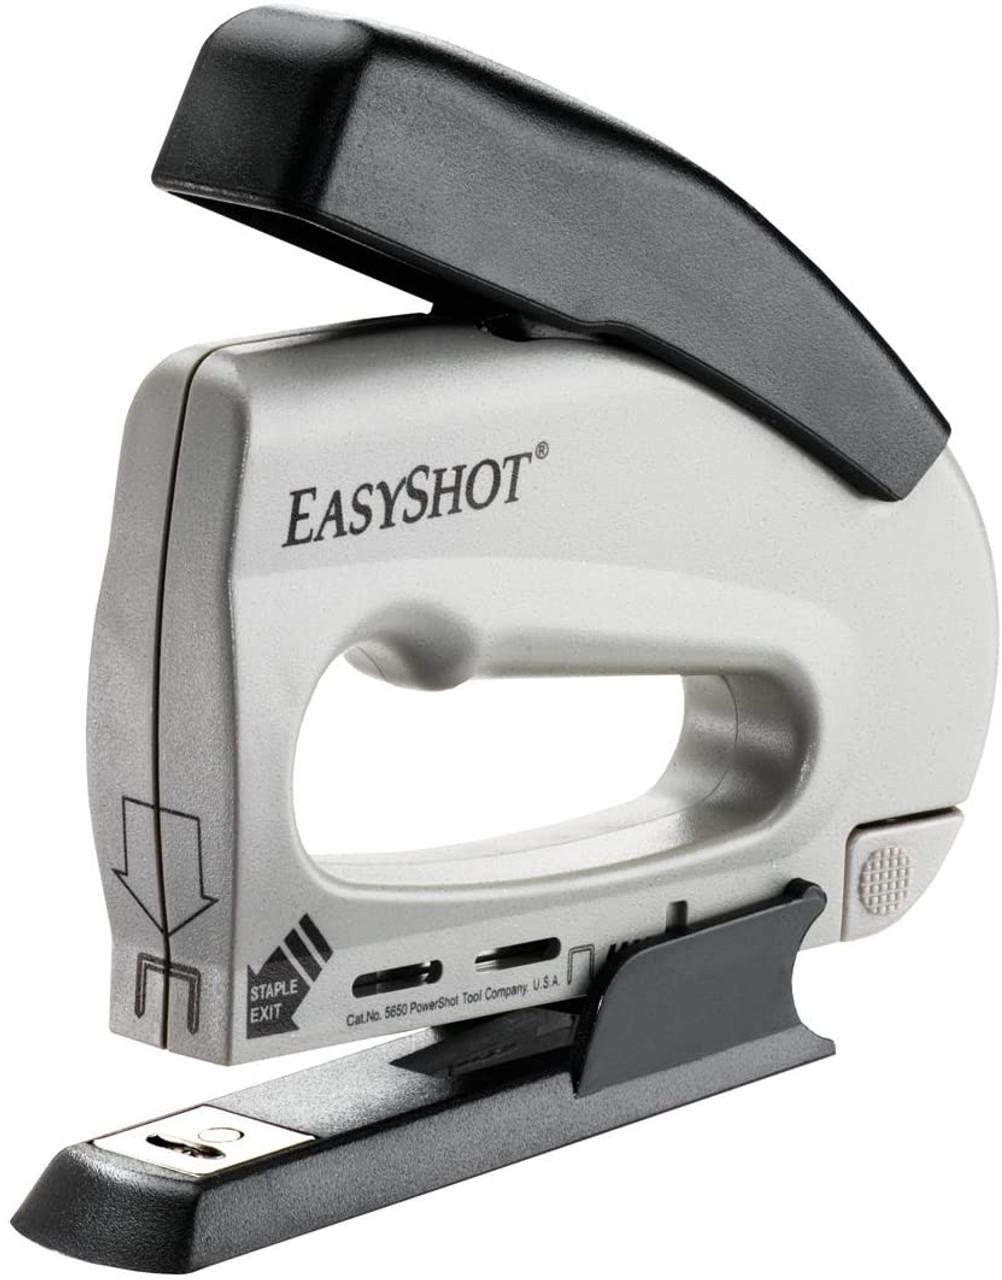 Arrow Fastener 5650DT Easyshot Stapler with Desktop Attachment